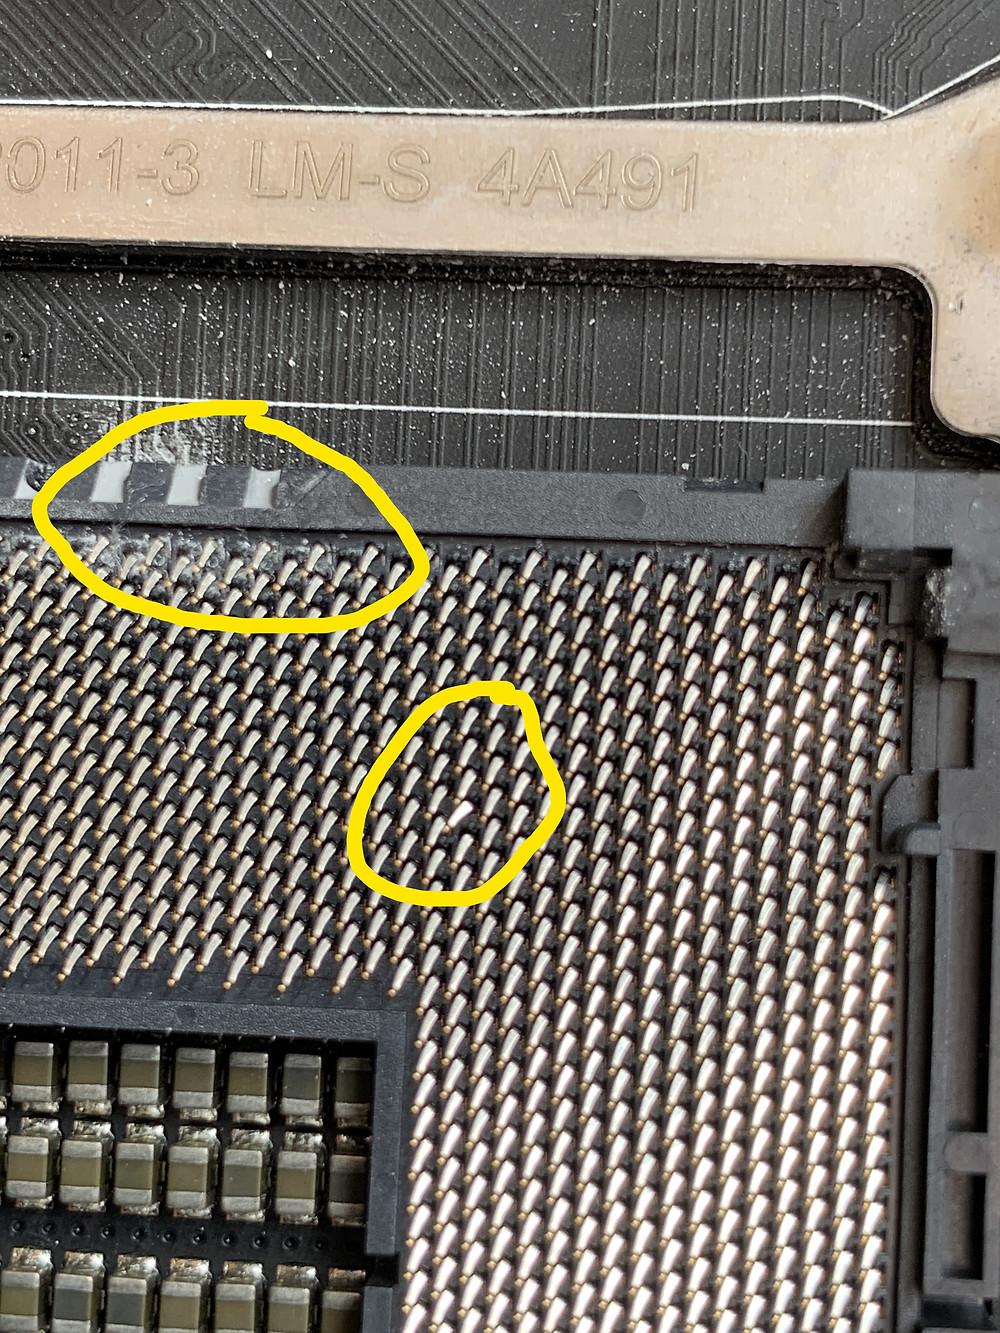 Damaged CPU Socket connectors